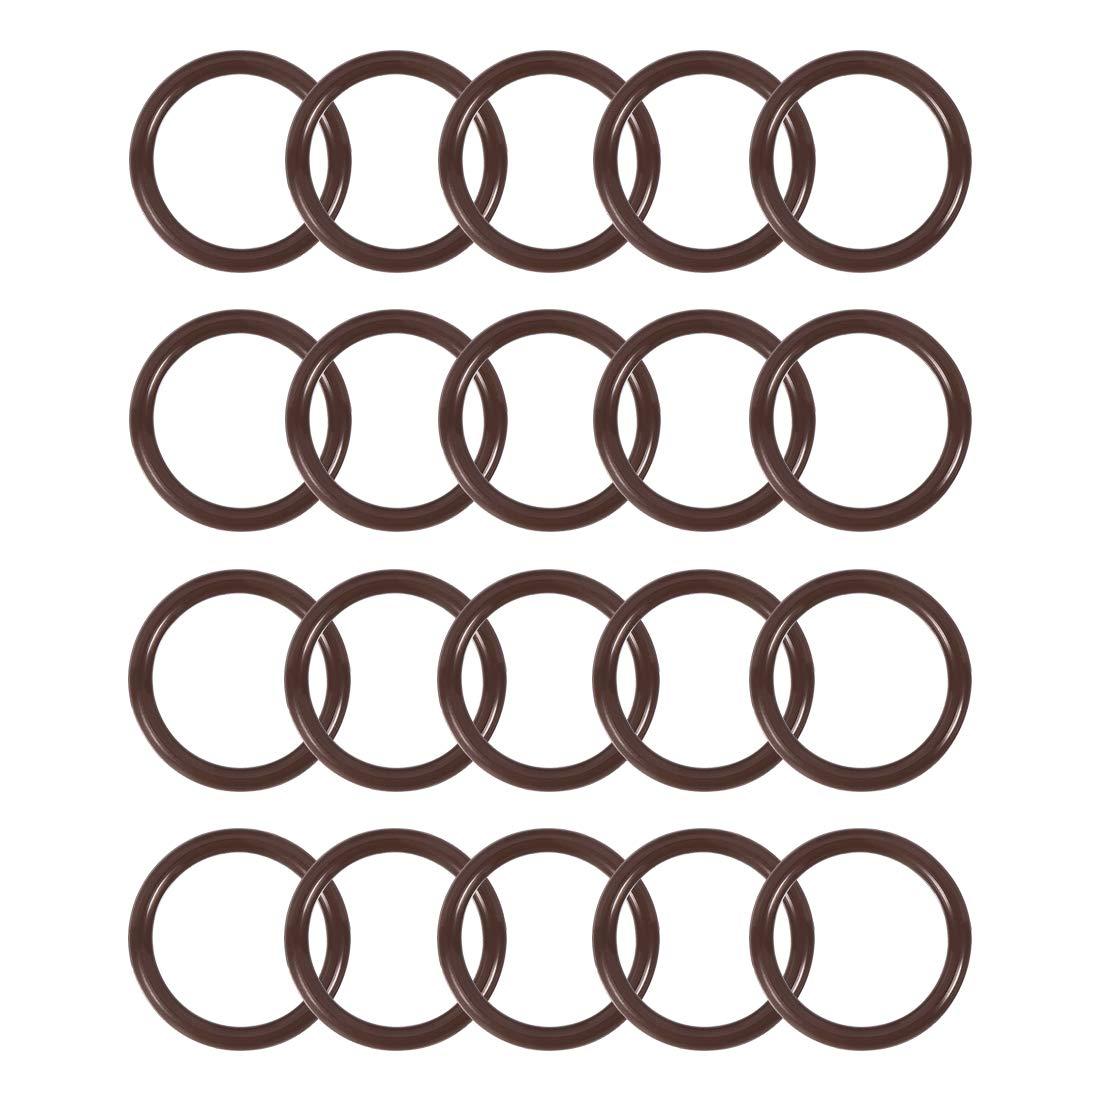 uxcell Fluorine Rubber O-Rings 13mm OD 8mm ID 2.5mm Width FKM Seal Gasket Brown 20pcs